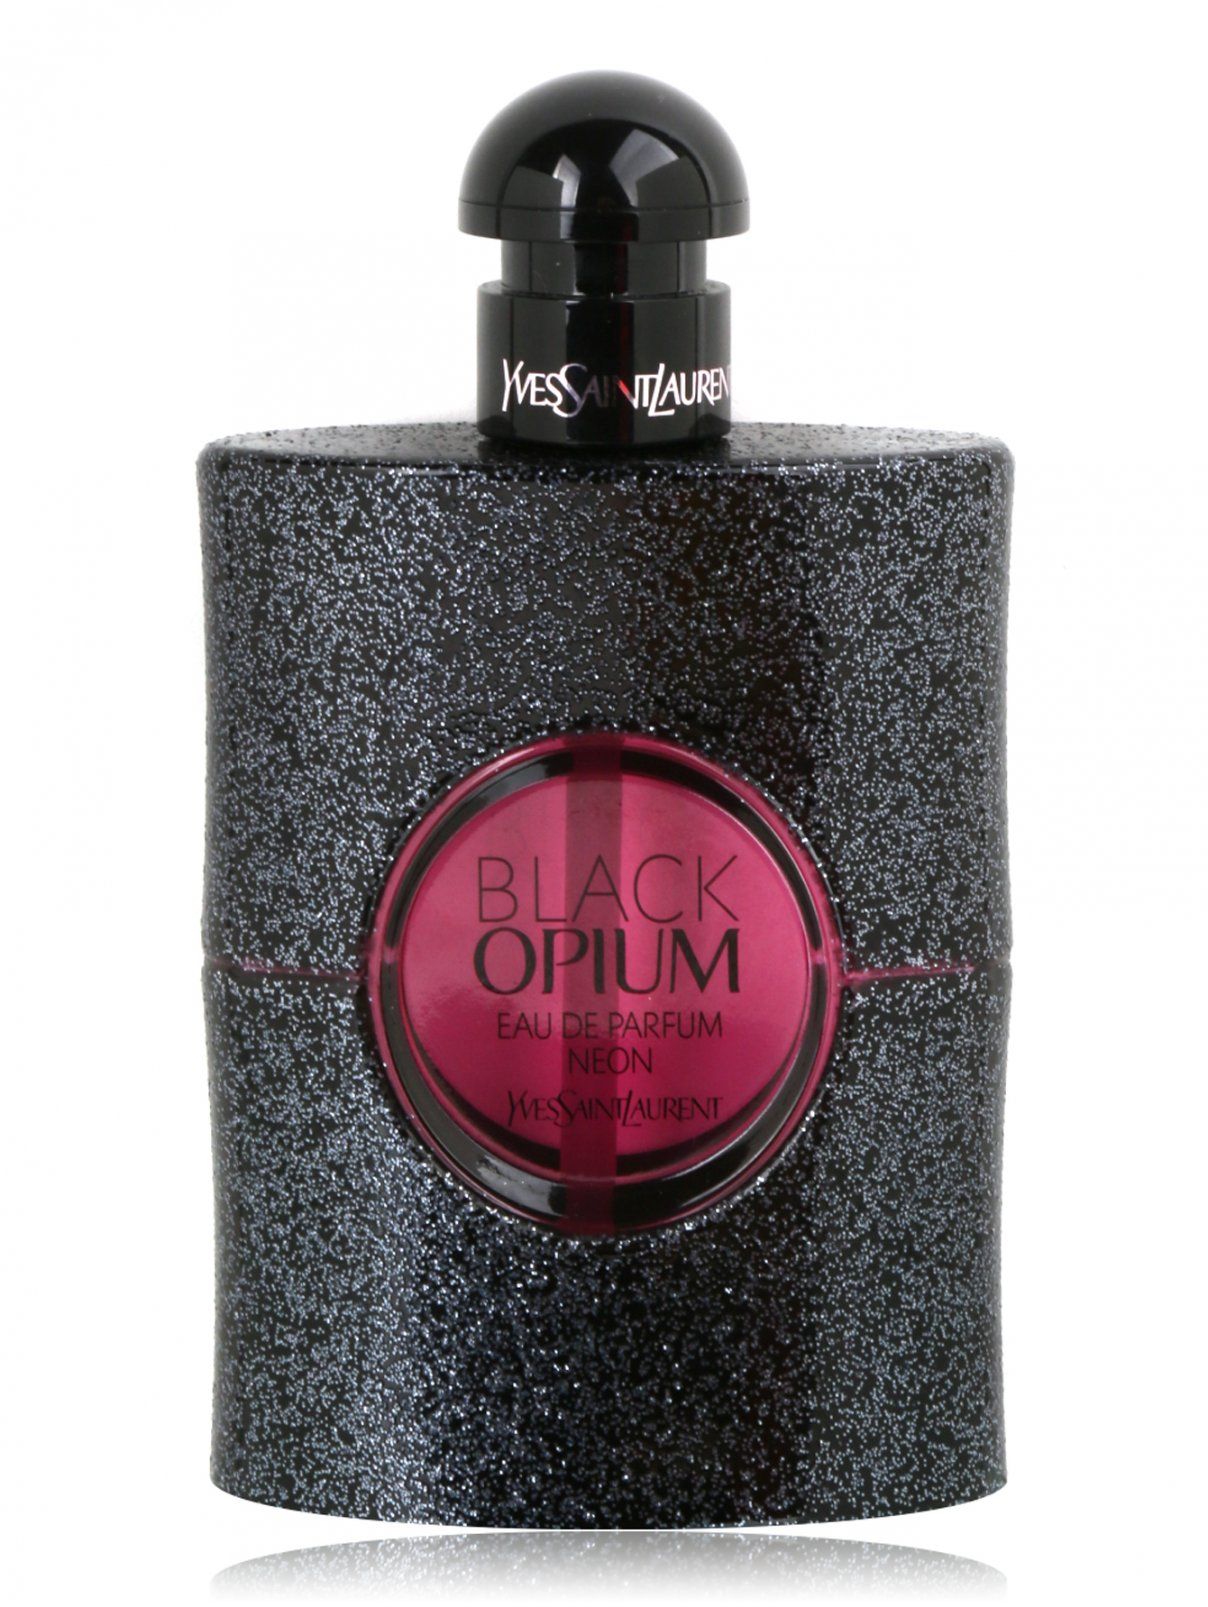 Парфюмерная вода 75 мл Black Opium Neon YSL  –  Общий вид